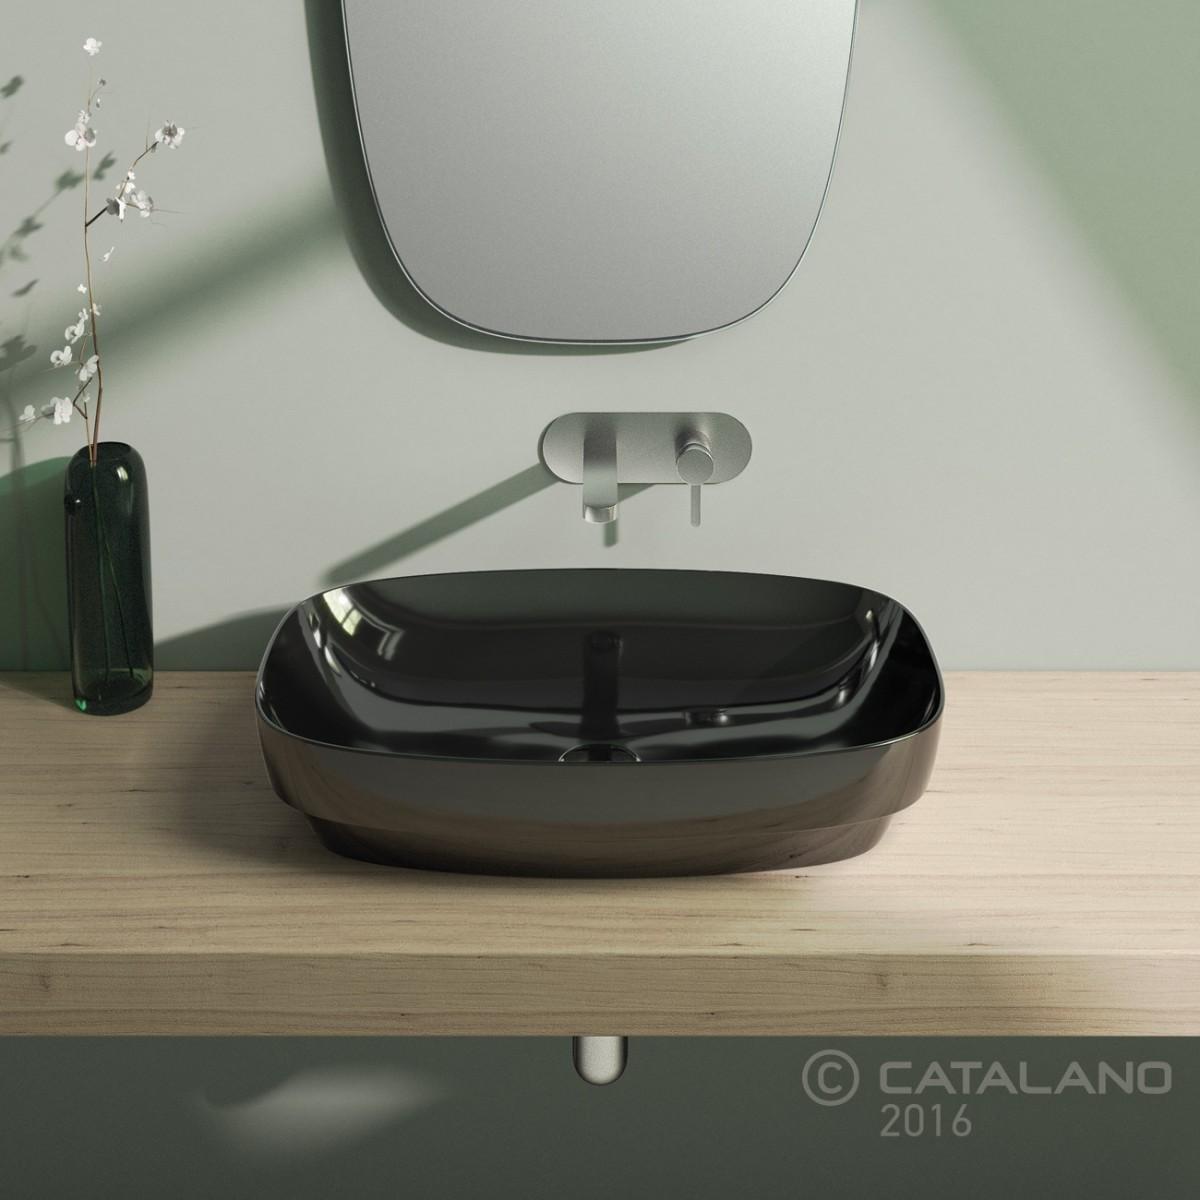 Catalano Colori Green Lux Раковина накладная 65*40, черная